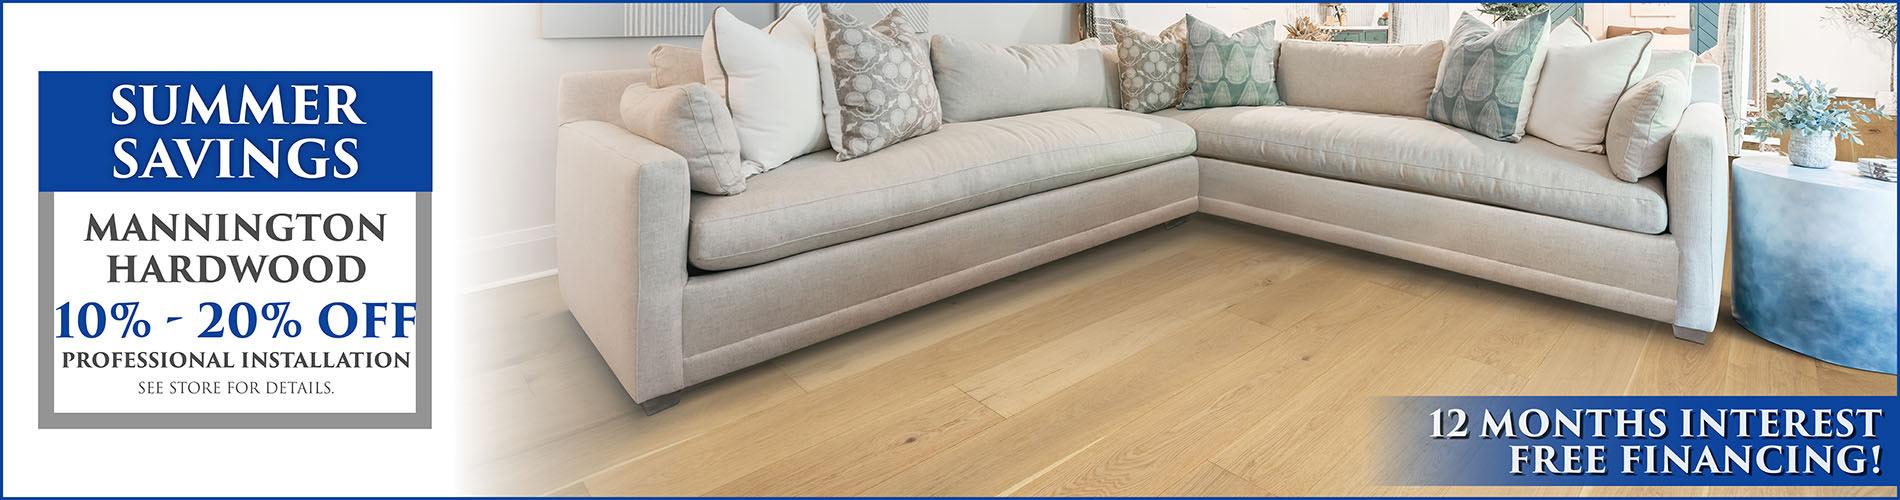 Summer Savings! Take 10% - 20% off Mannington hardwood. Professional installation